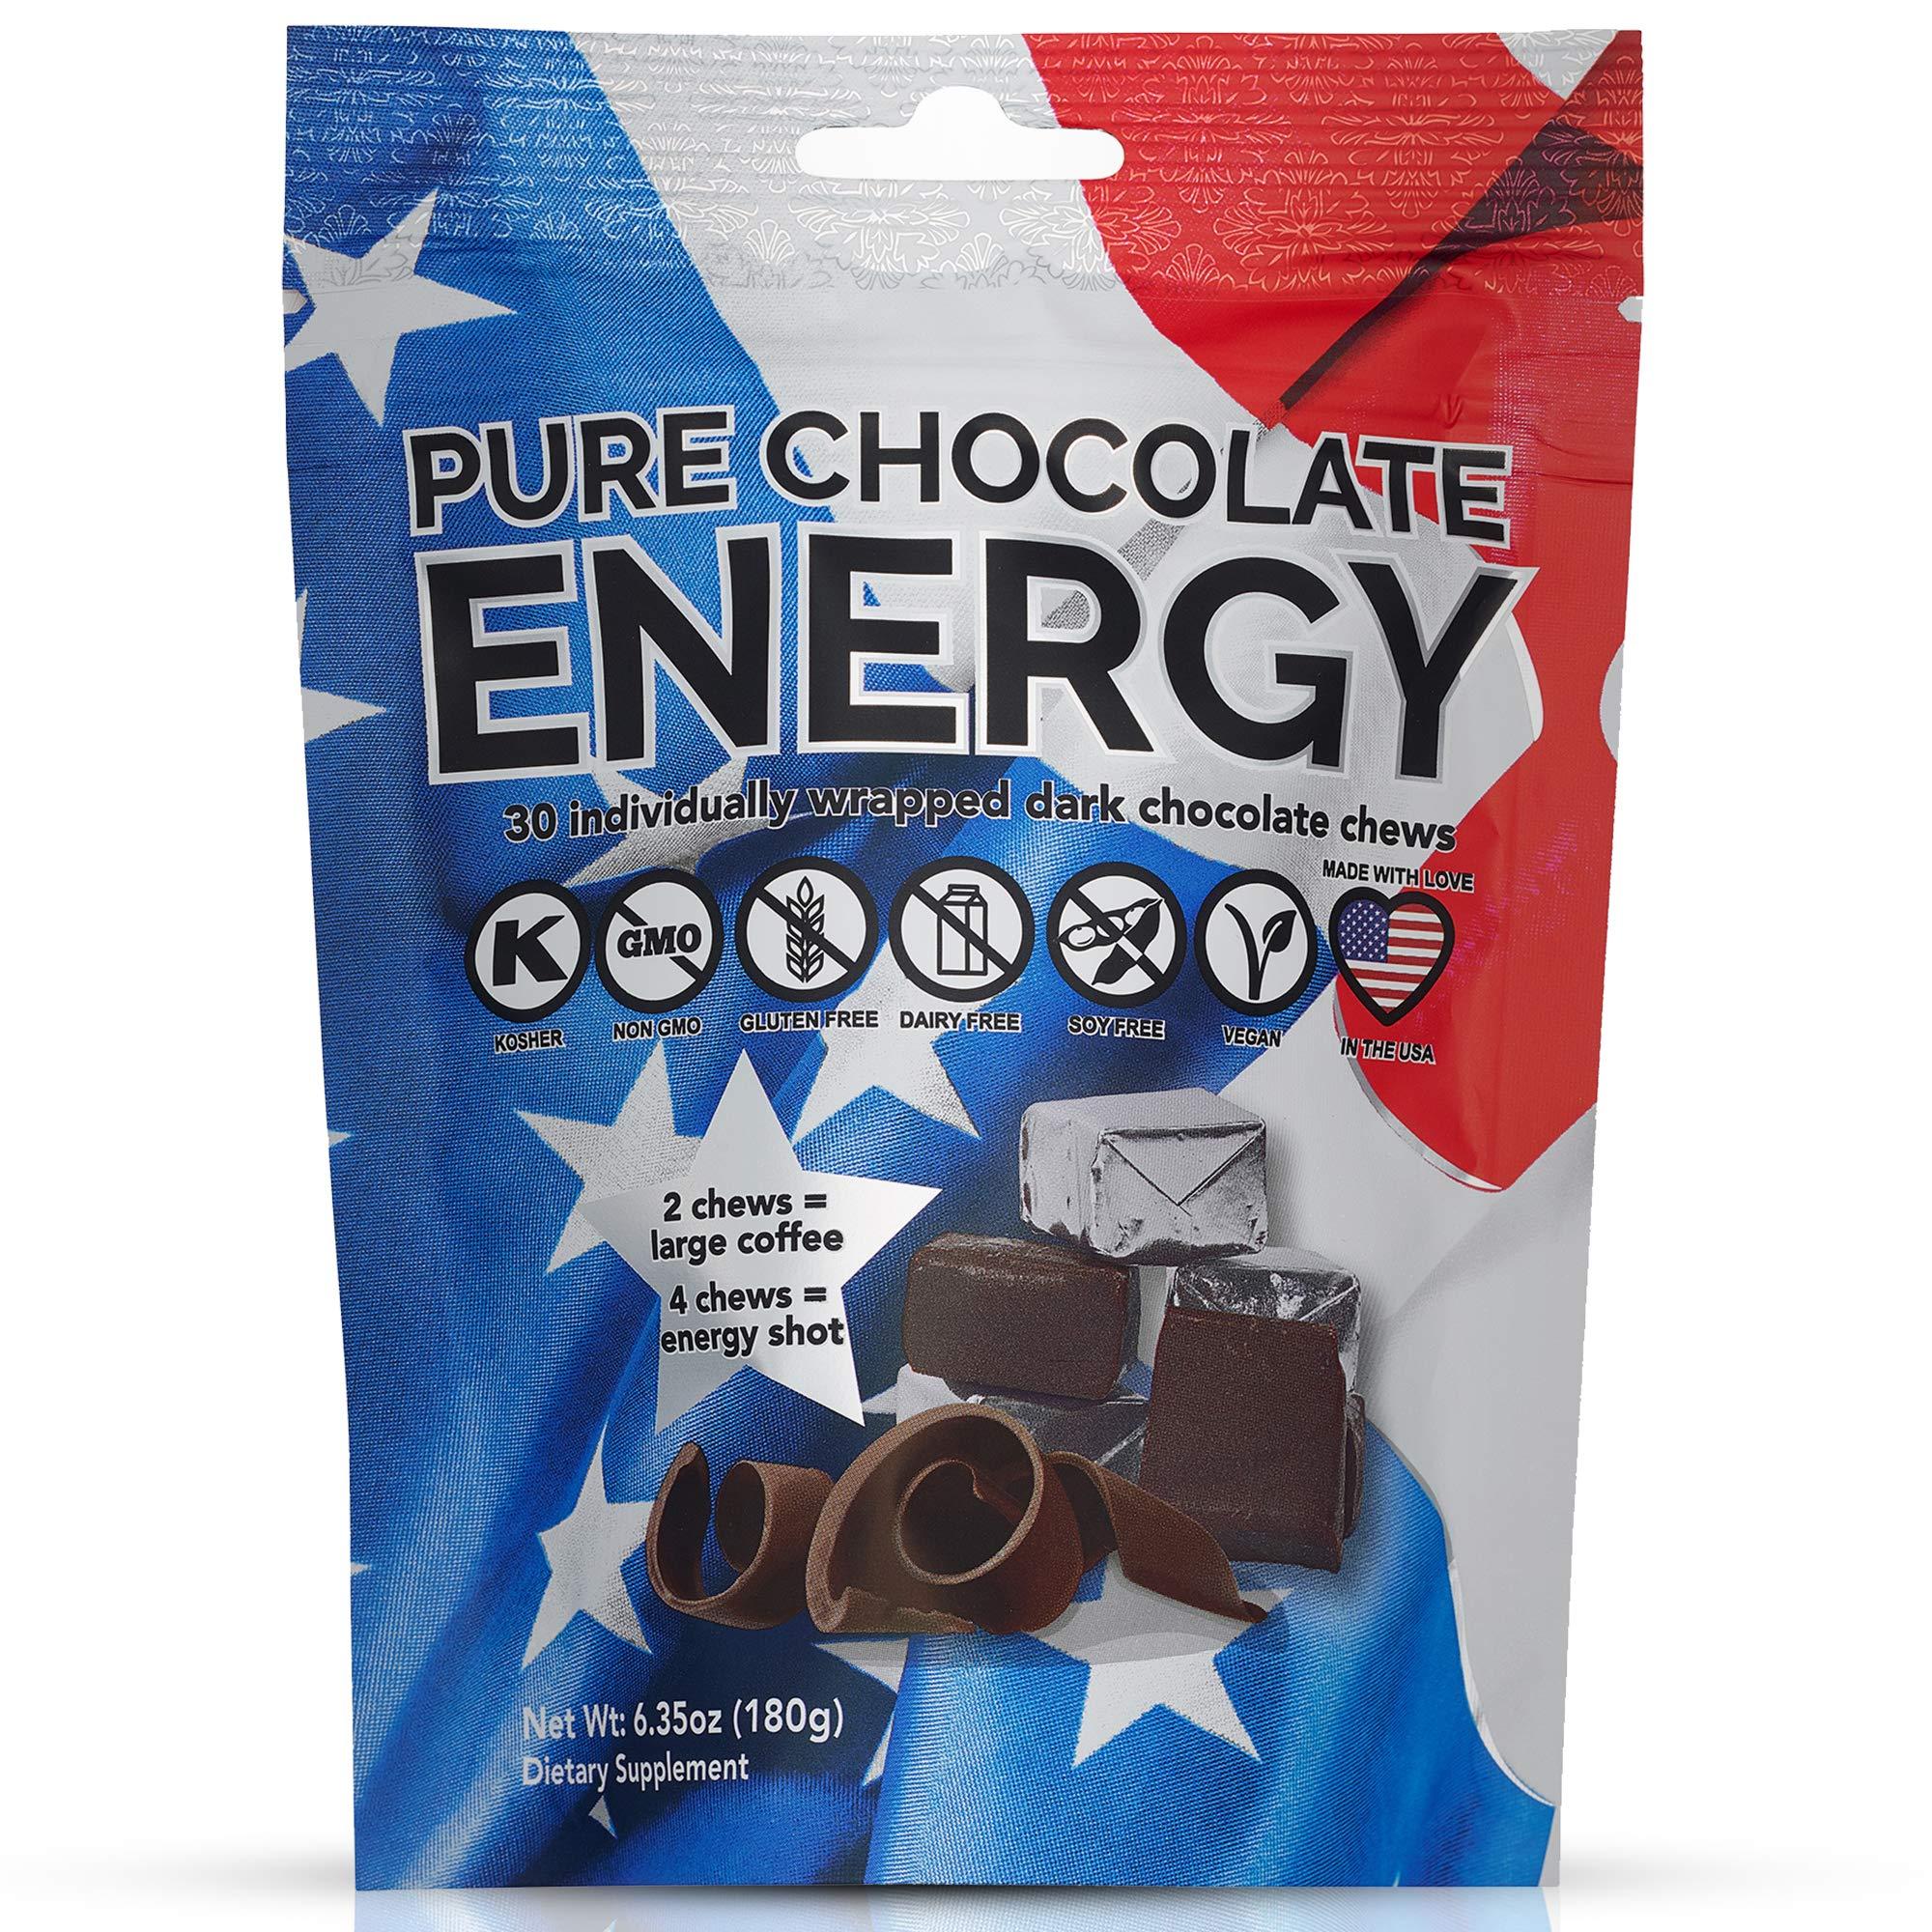 Pure Chocolate Energy Chews - with Caffeine - Dark Chocolate (30 Count)